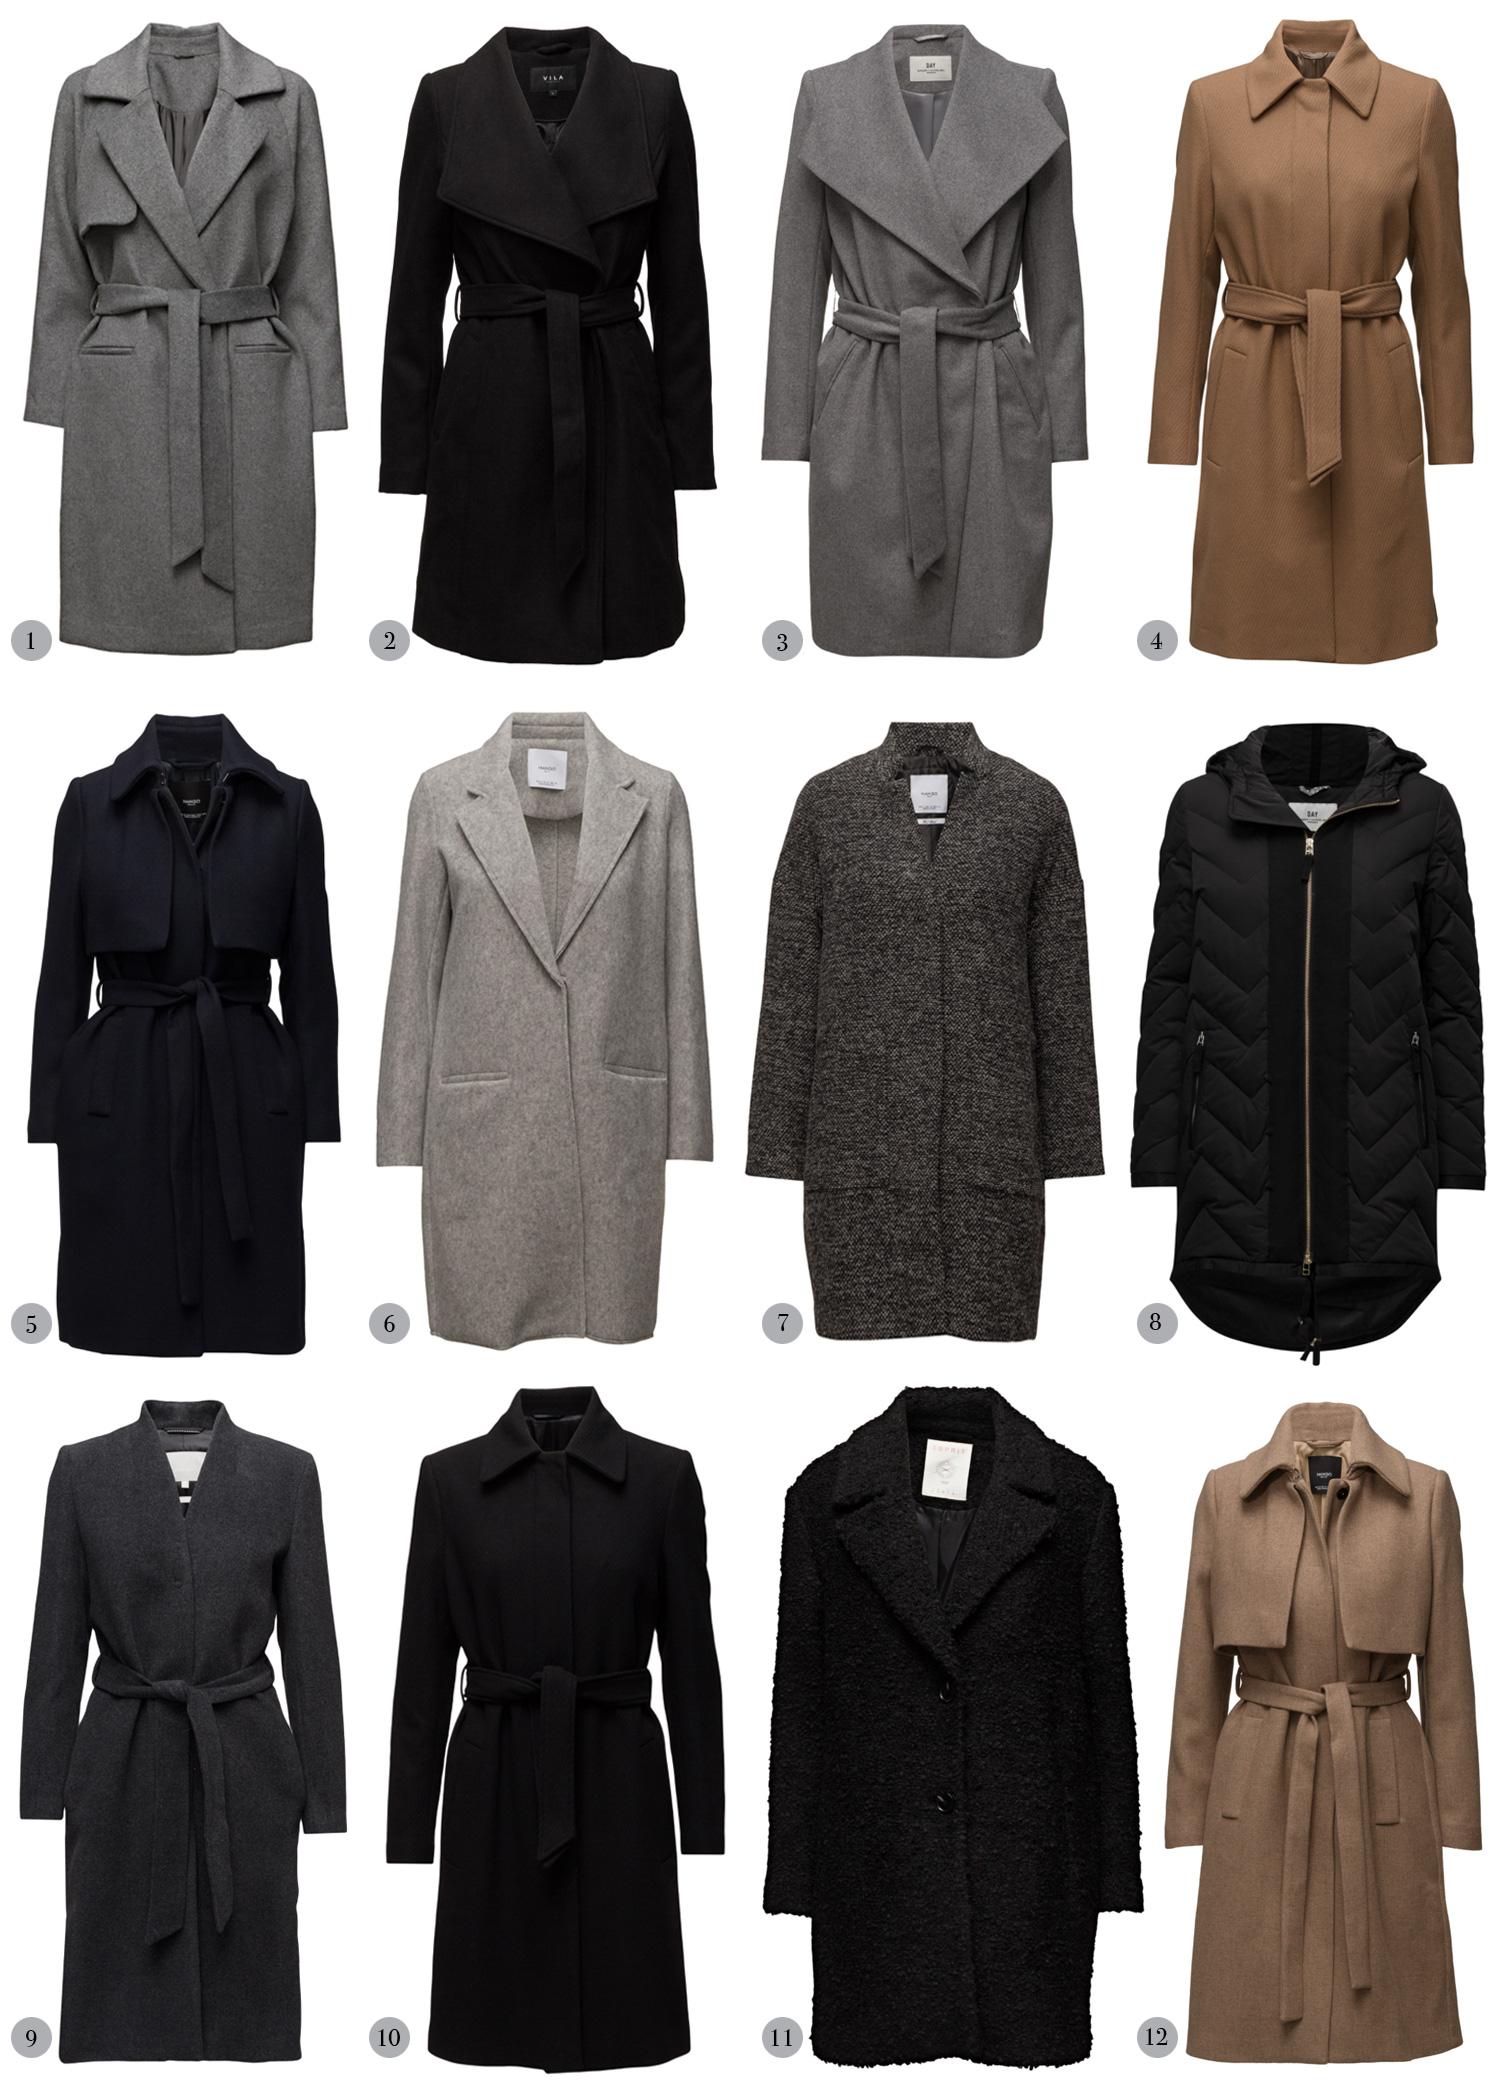 7a6976b283b 12 lovely coats - Christina Dueholm